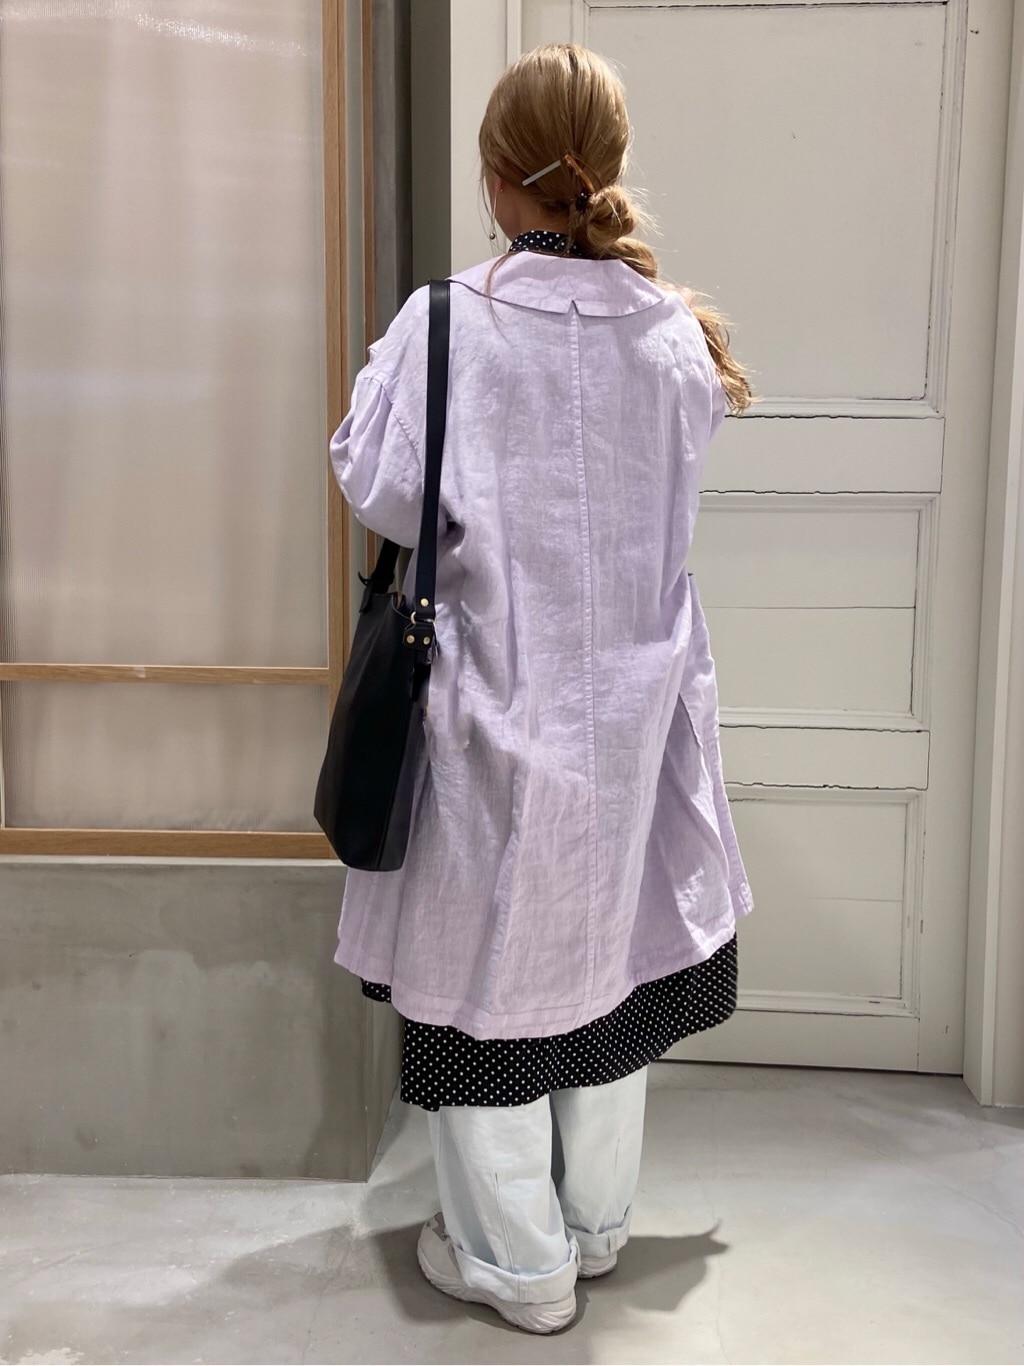 bulle de savon 渋谷スクランブルスクエア 身長:160cm 2021.03.12